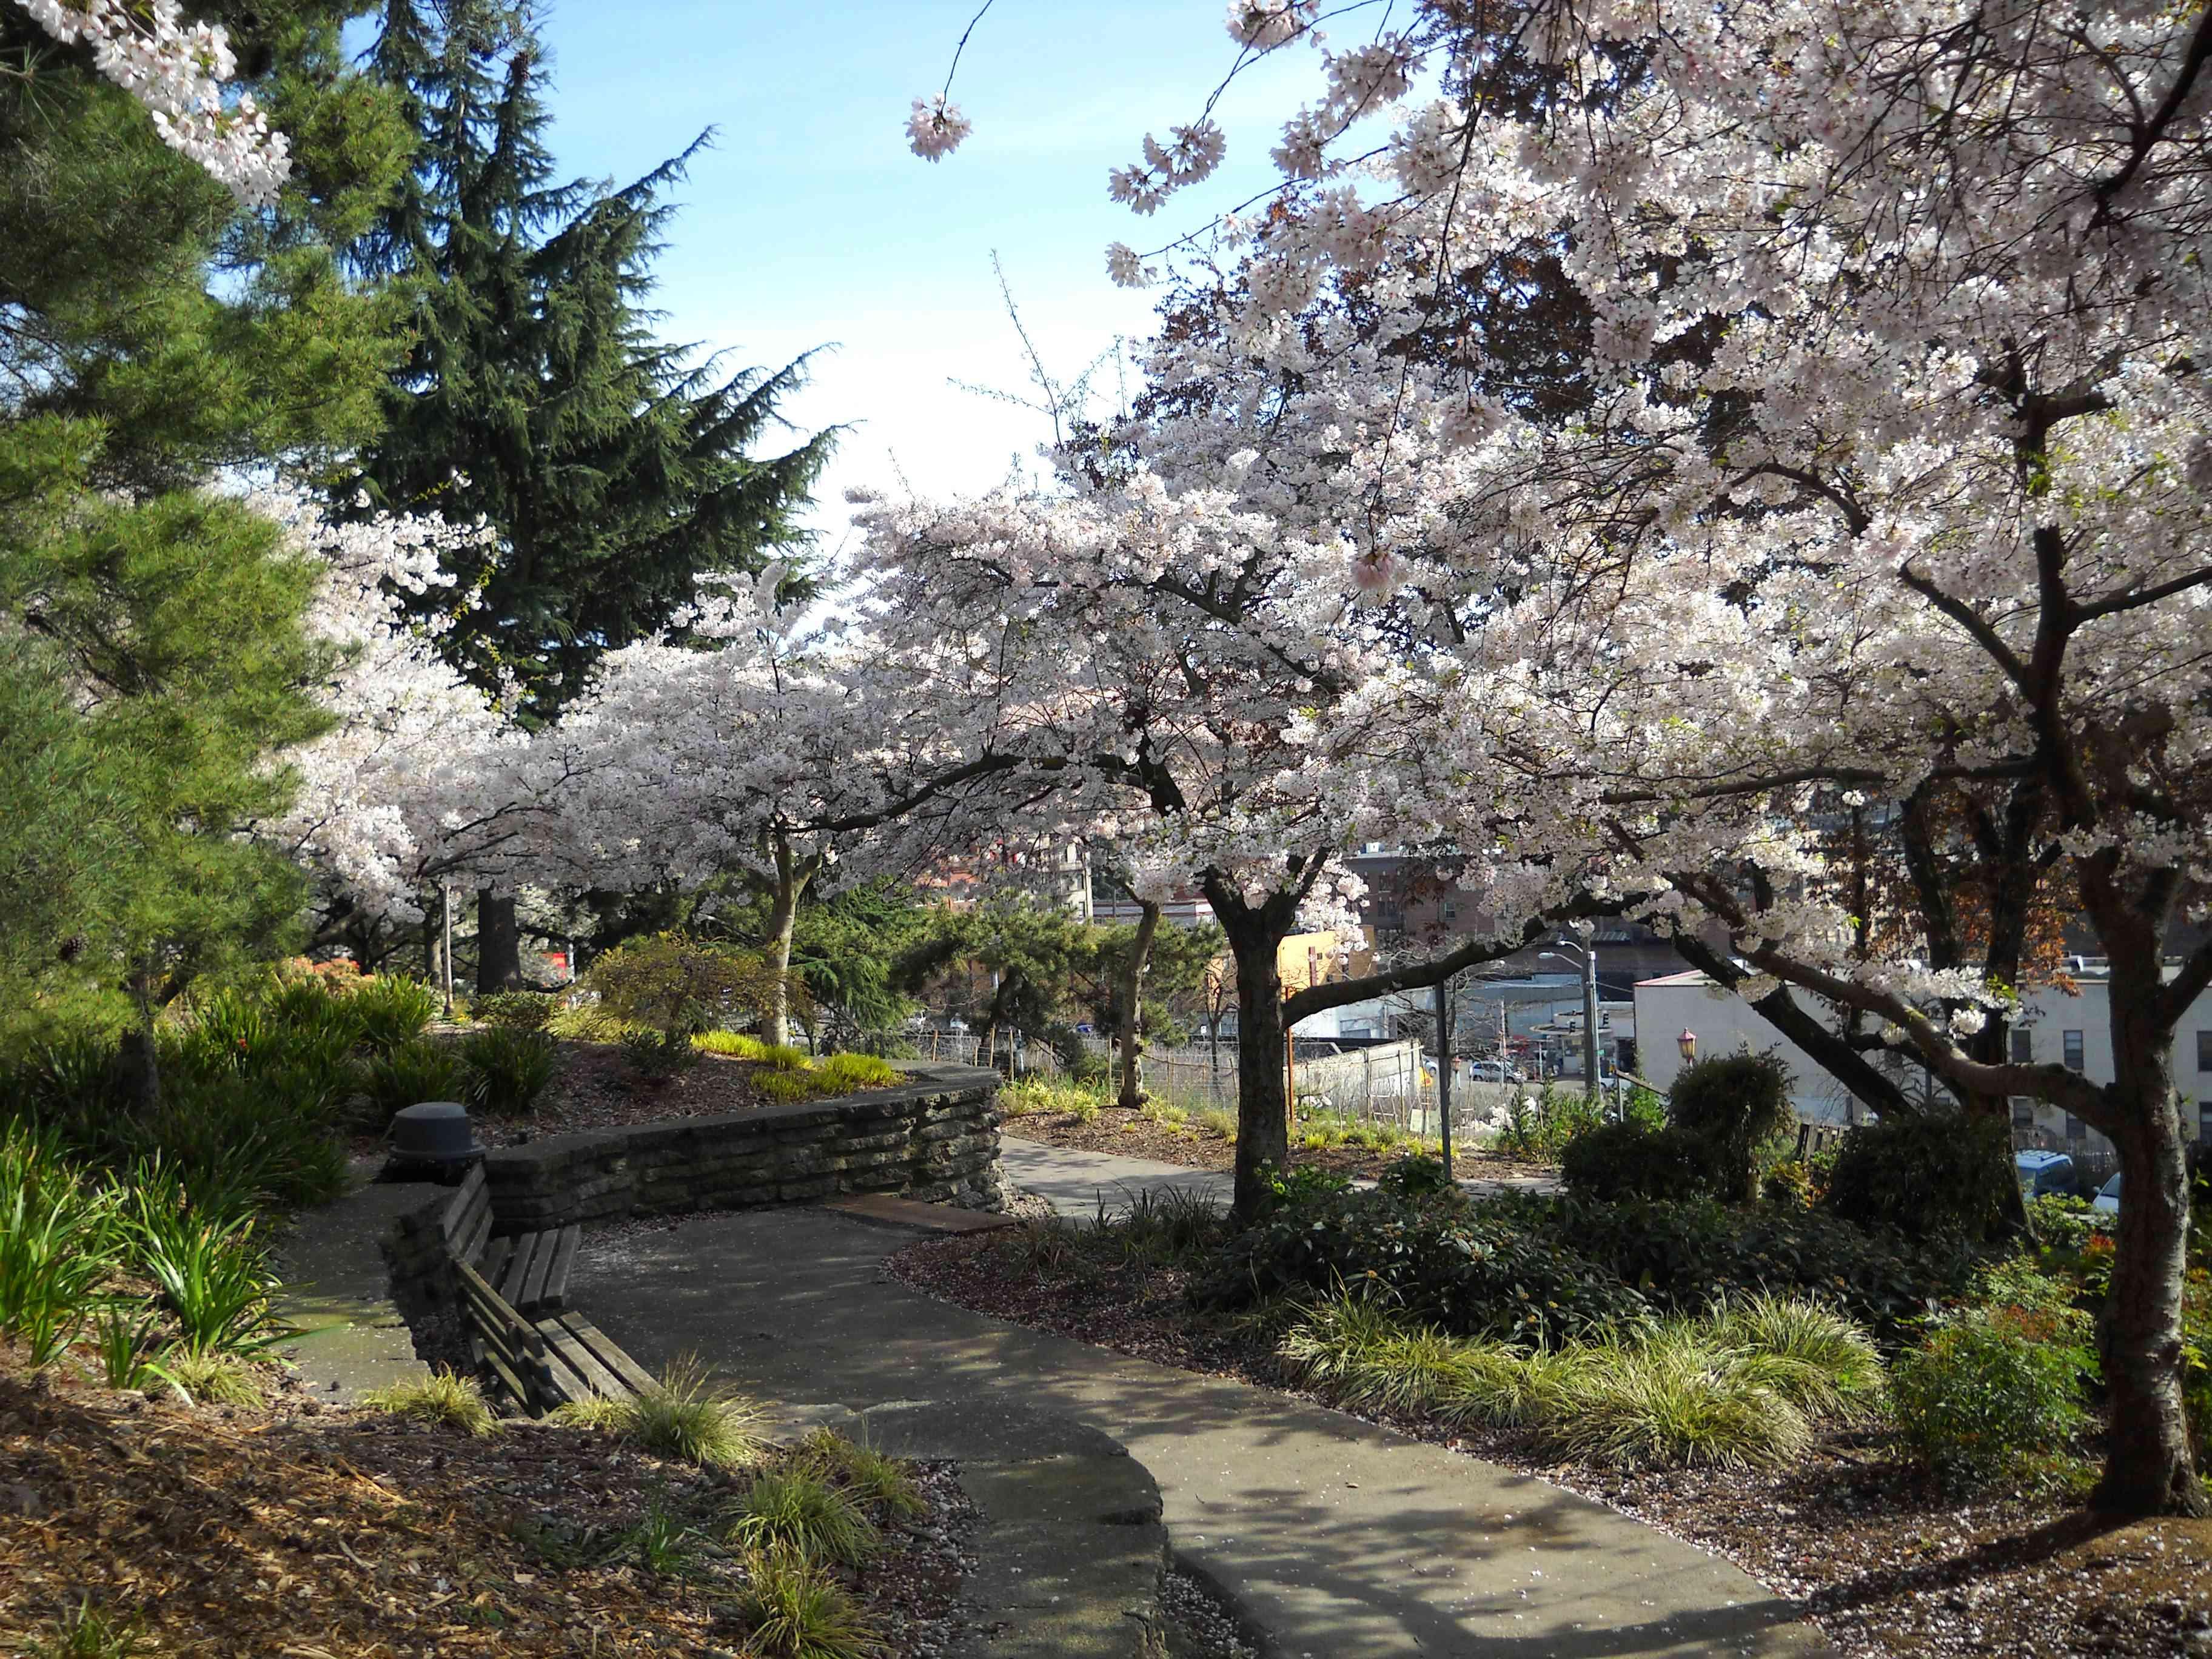 Cherry trees in bloom at Kobe Terrace